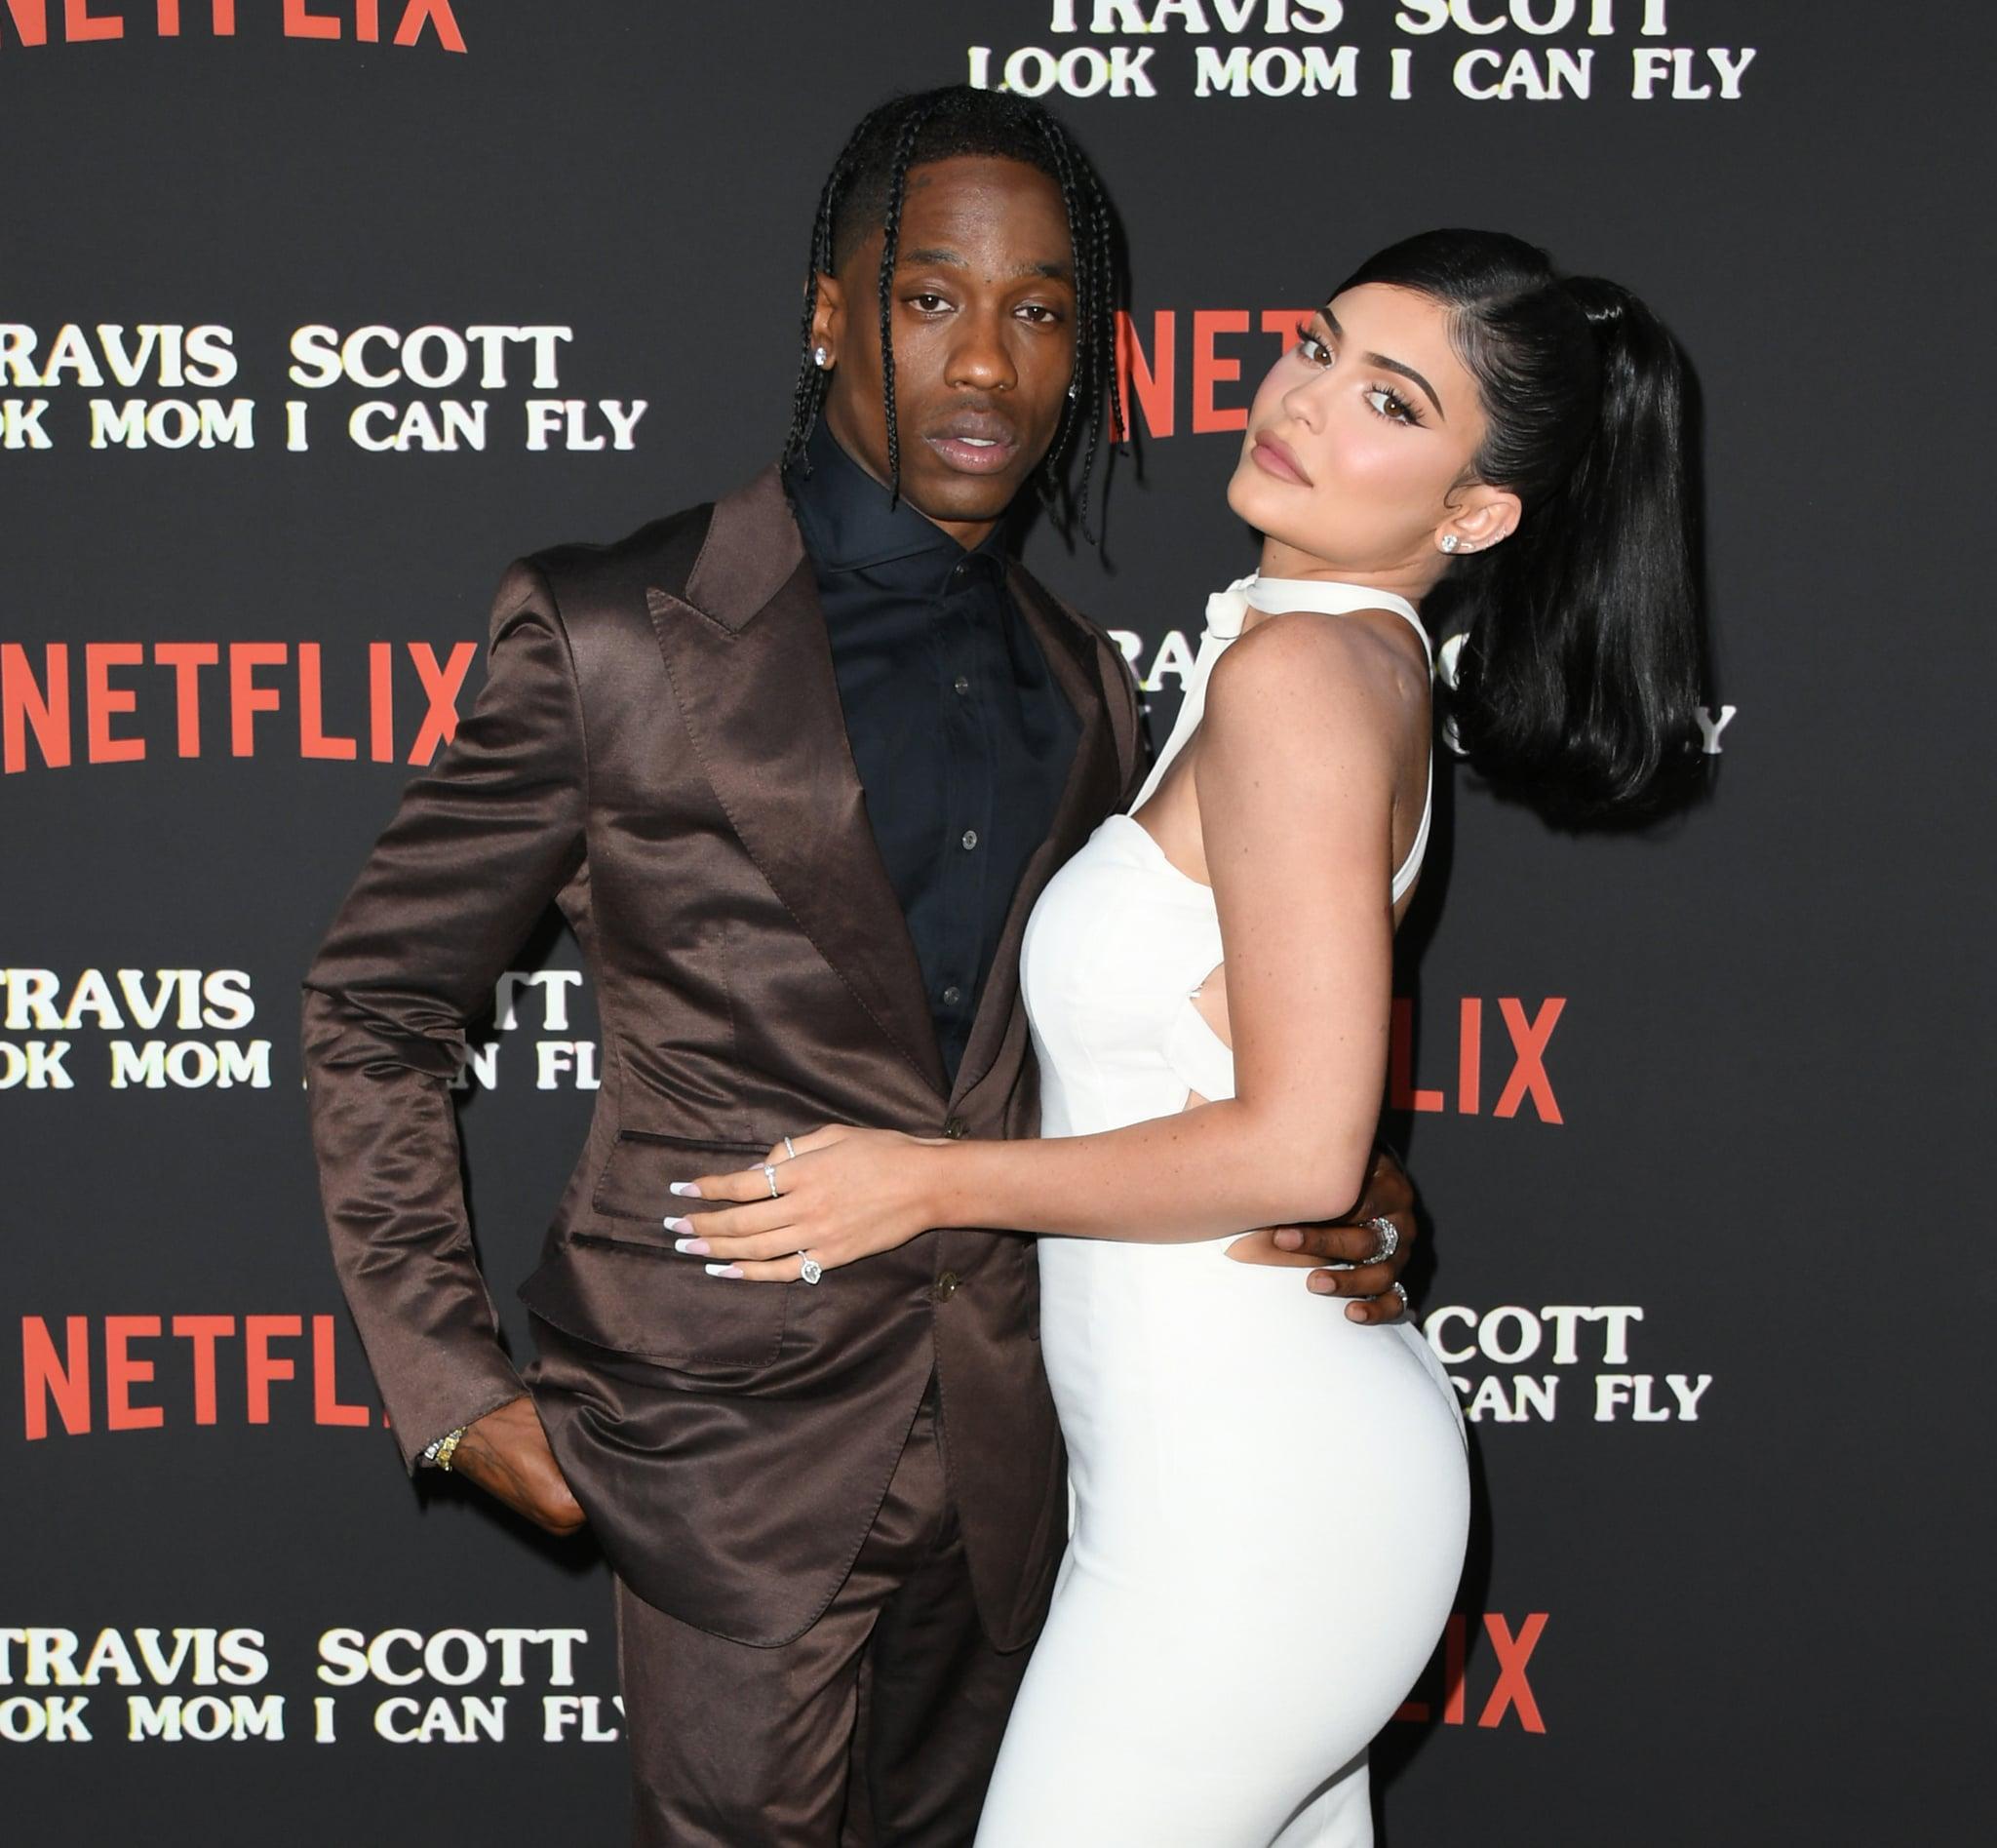 SANTA MONICA, CALIFORNIA - AUGUST 27:  Travis Scott and Kylie Jenner attend the Premiere Of Netflix's